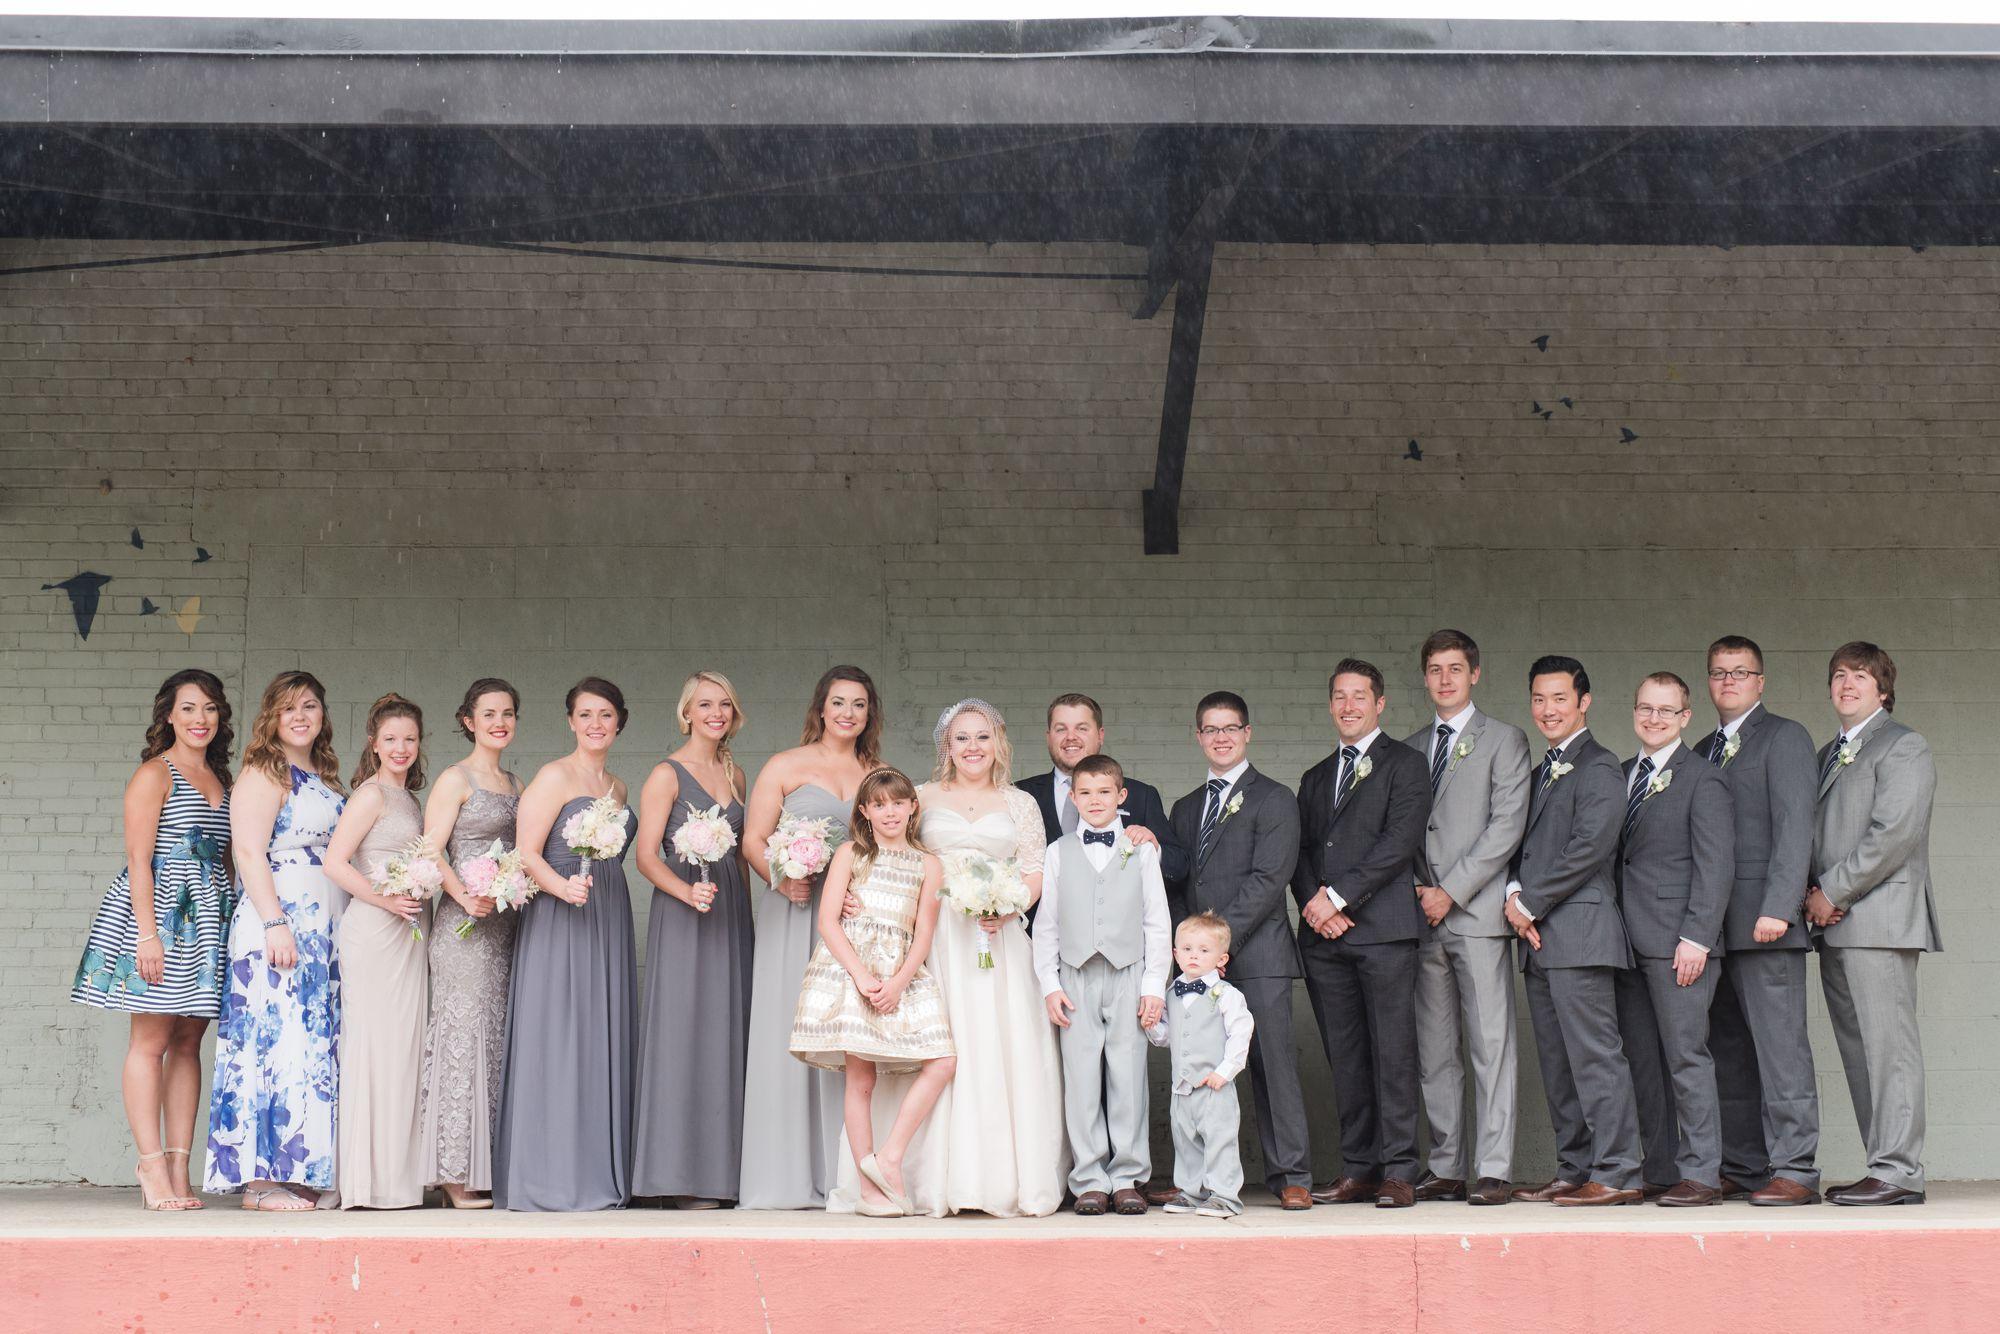 uptown-charlotte-warhouse-wedding 43